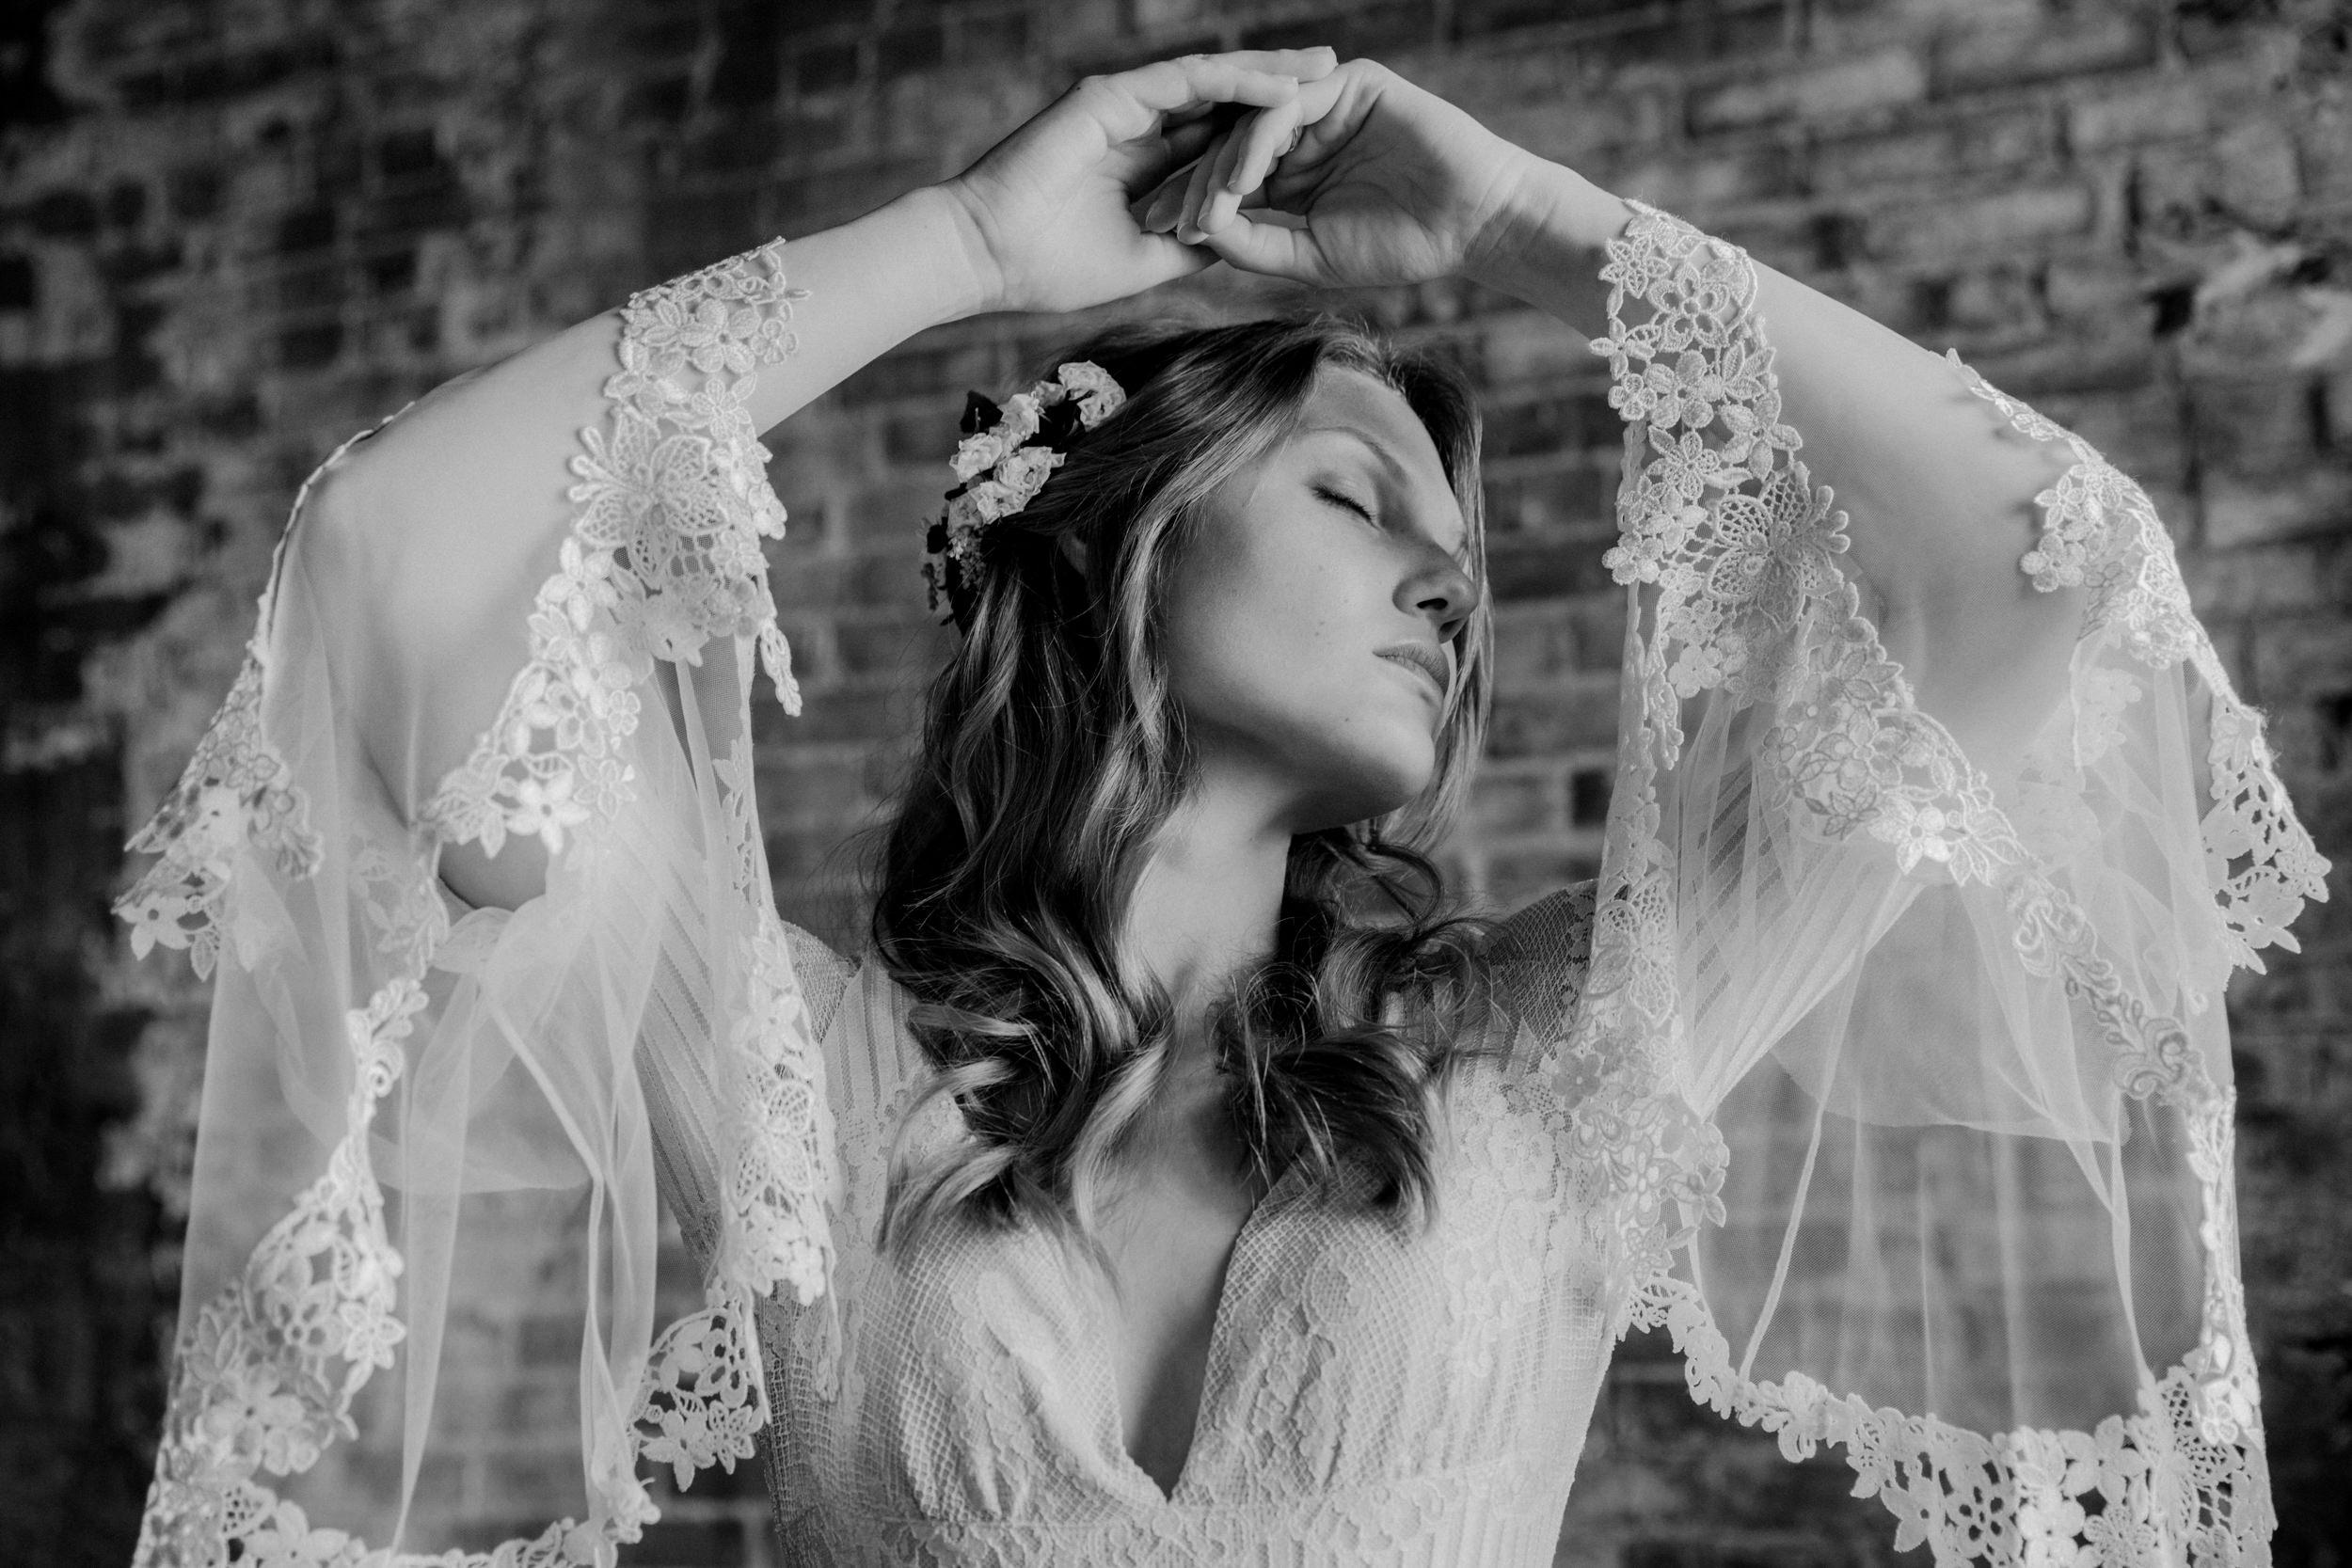 fidelio_boho_styled_wedding014bw.jpg